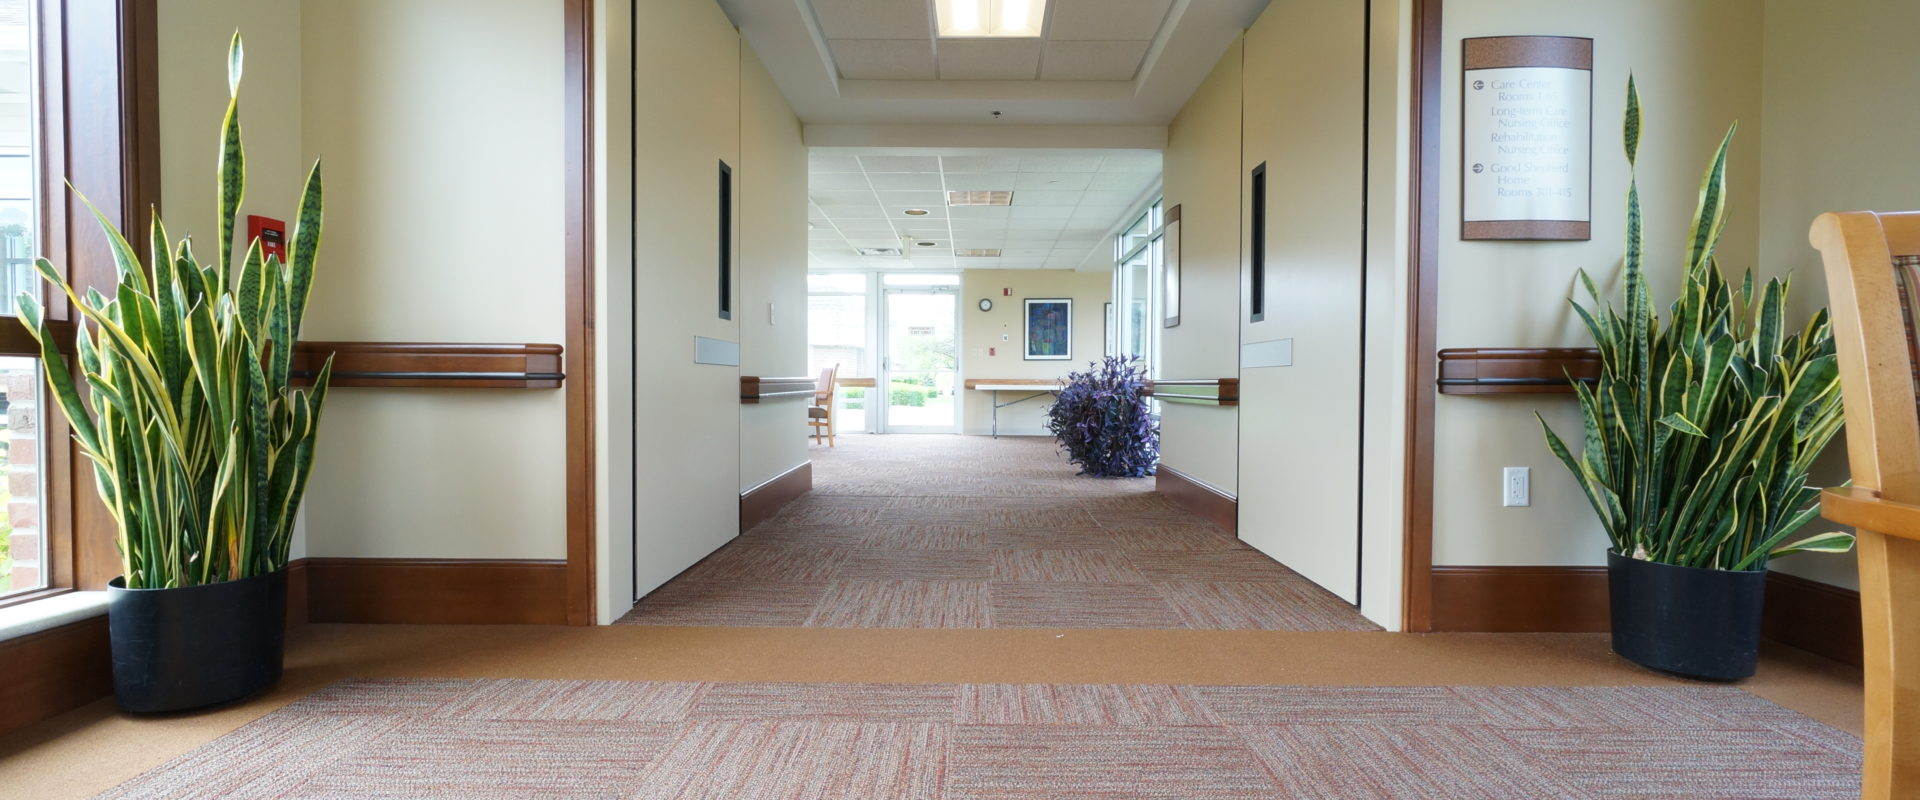 Area Separation Doors on Hold Open